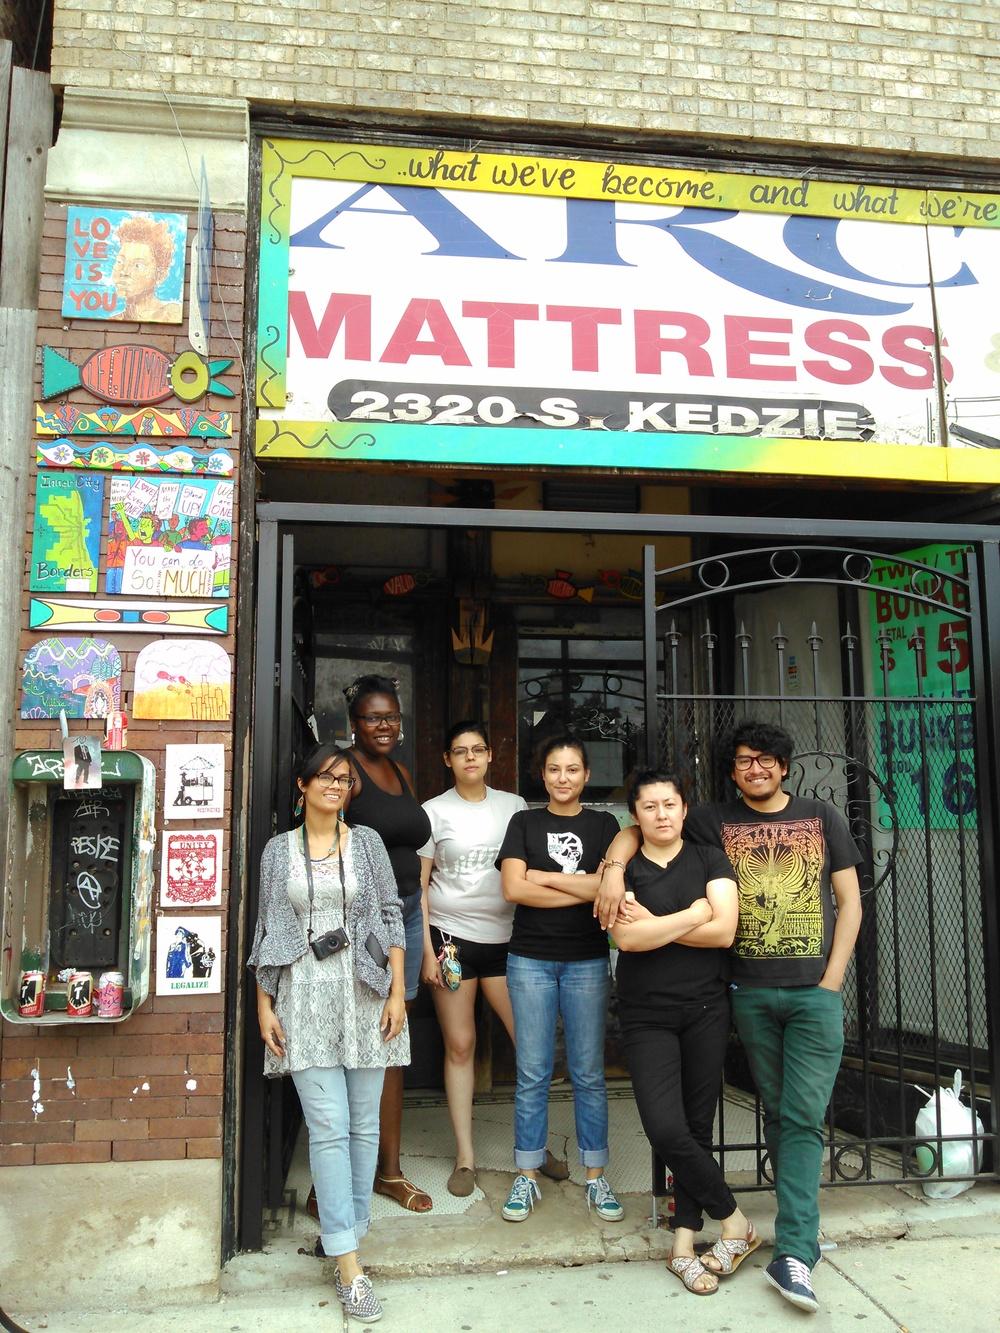 From left to right: Amara Betty Martin, Jenese Jackson,Erica Sanchez, Sara Cortez, Rosa Rodriguez and Jhonatan Carbonell.